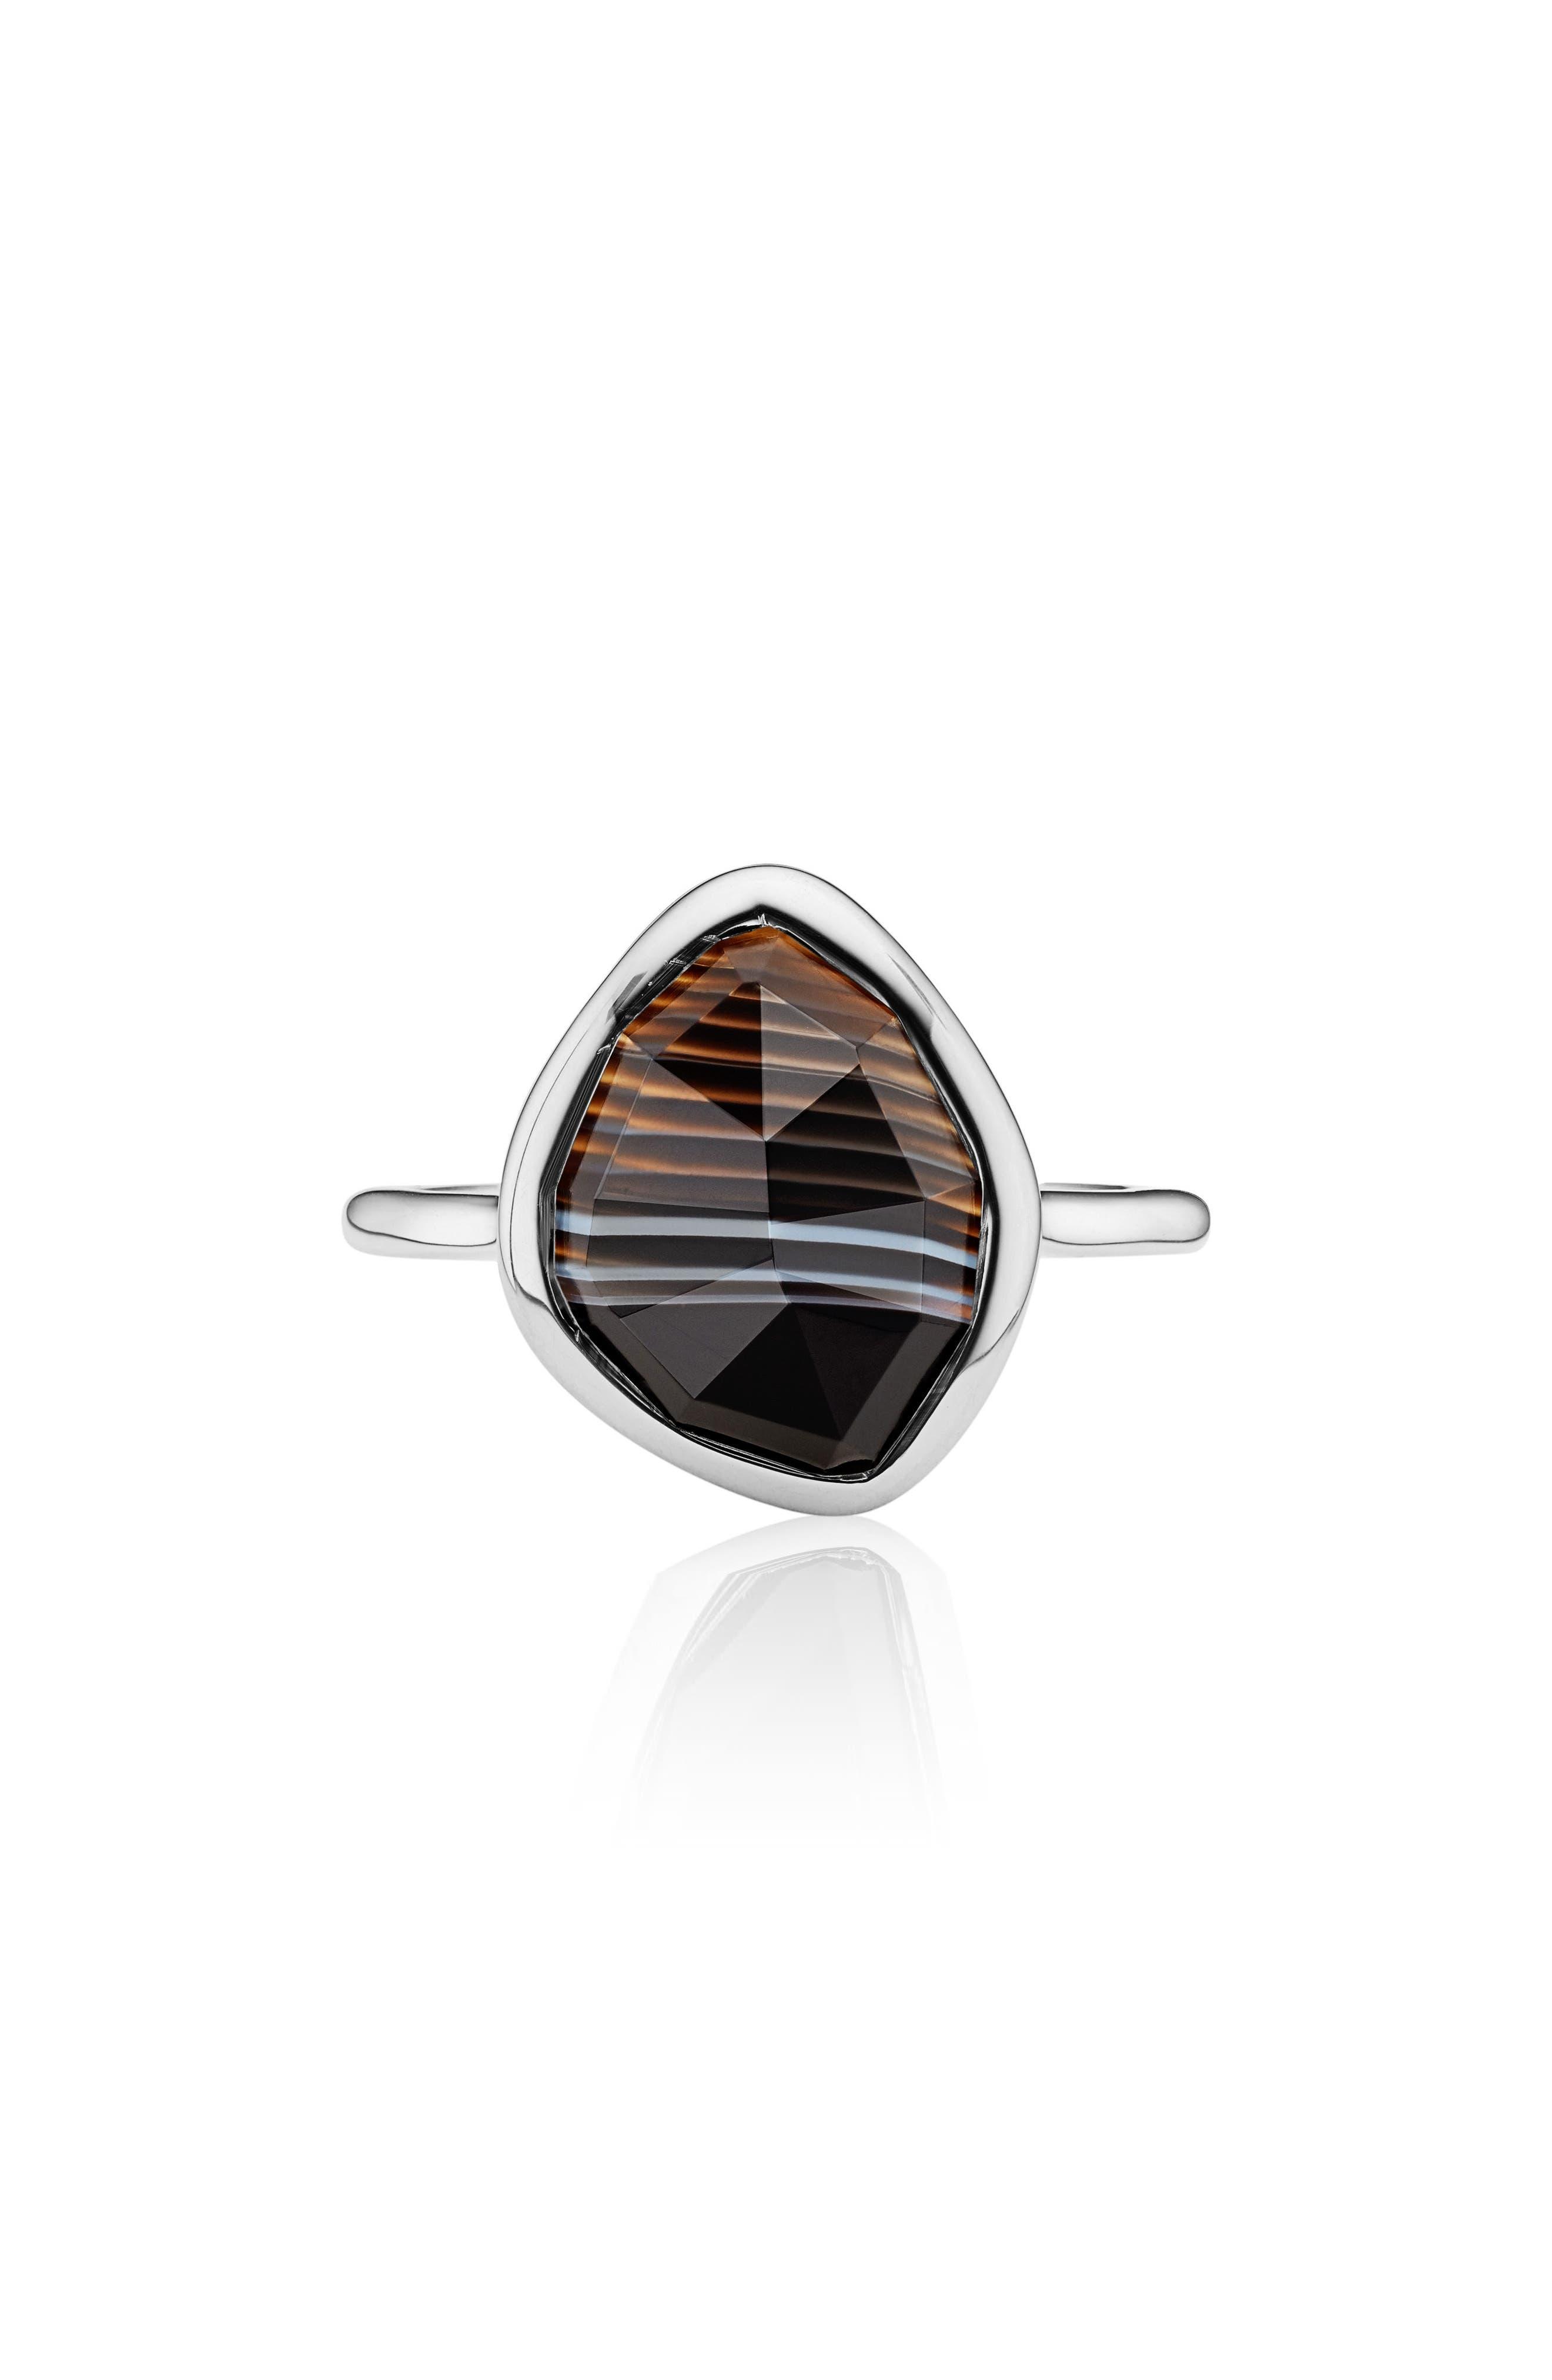 Siren Nugget Semiprecious Stacking Ring,                             Main thumbnail 1, color,                             SILVER/ BLACK LINE ONYX